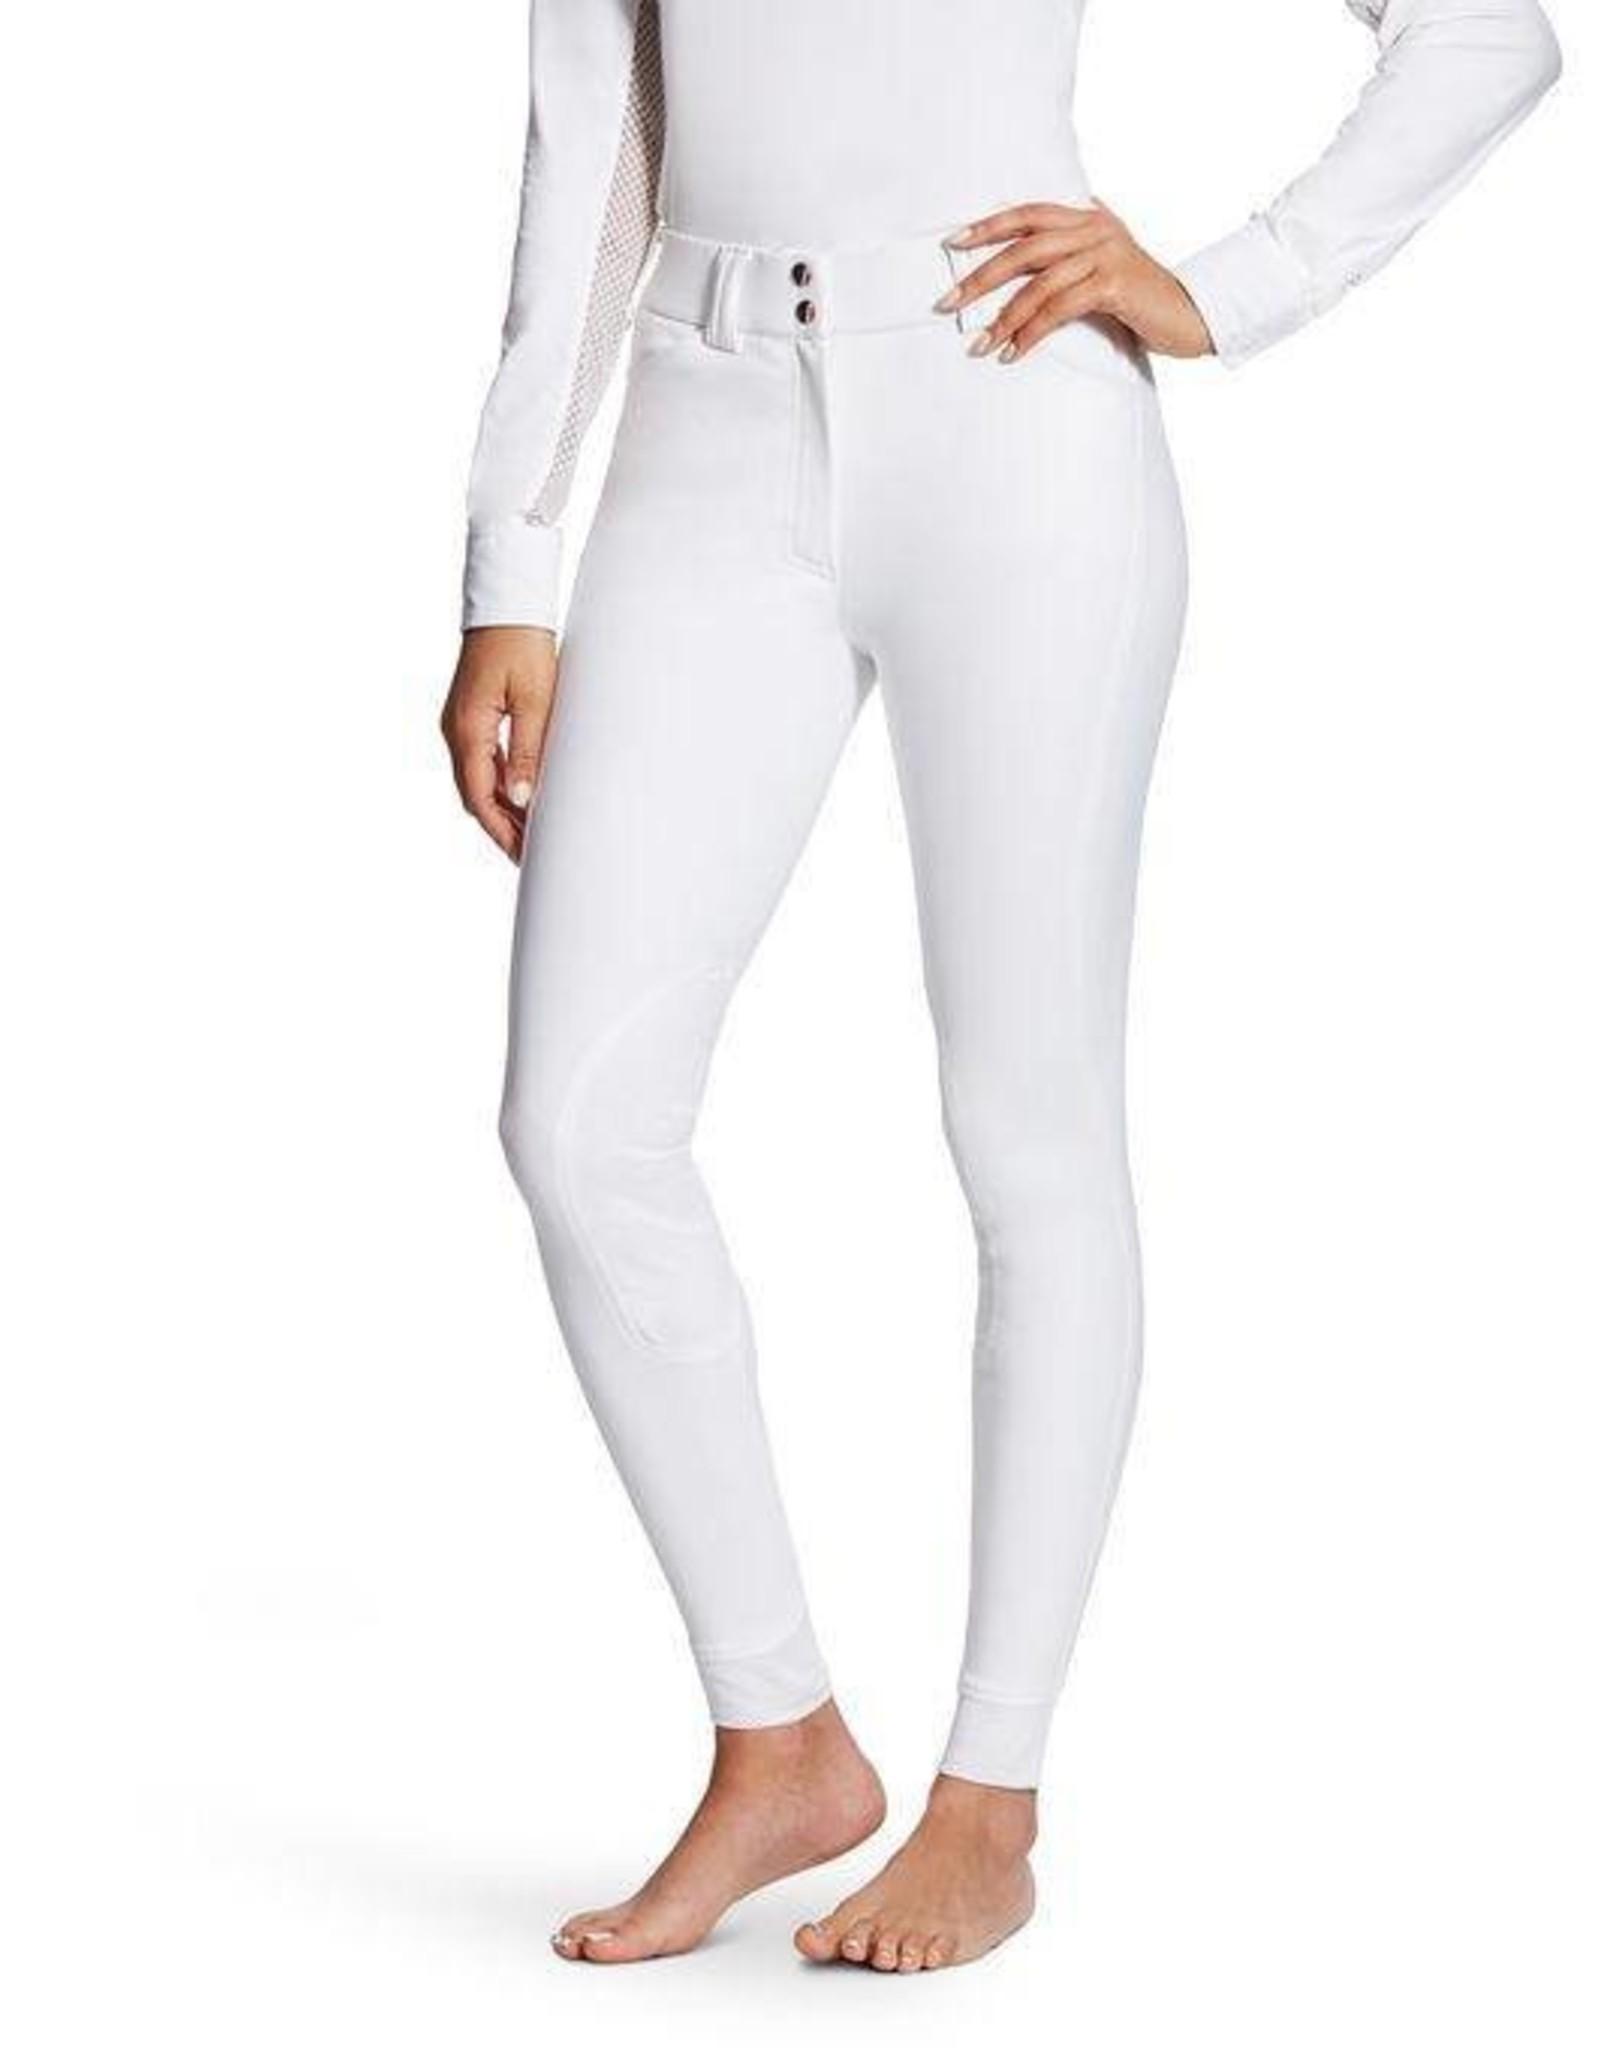 Ariat Ladies' Tri Factor Grip Knee Patch Breeches